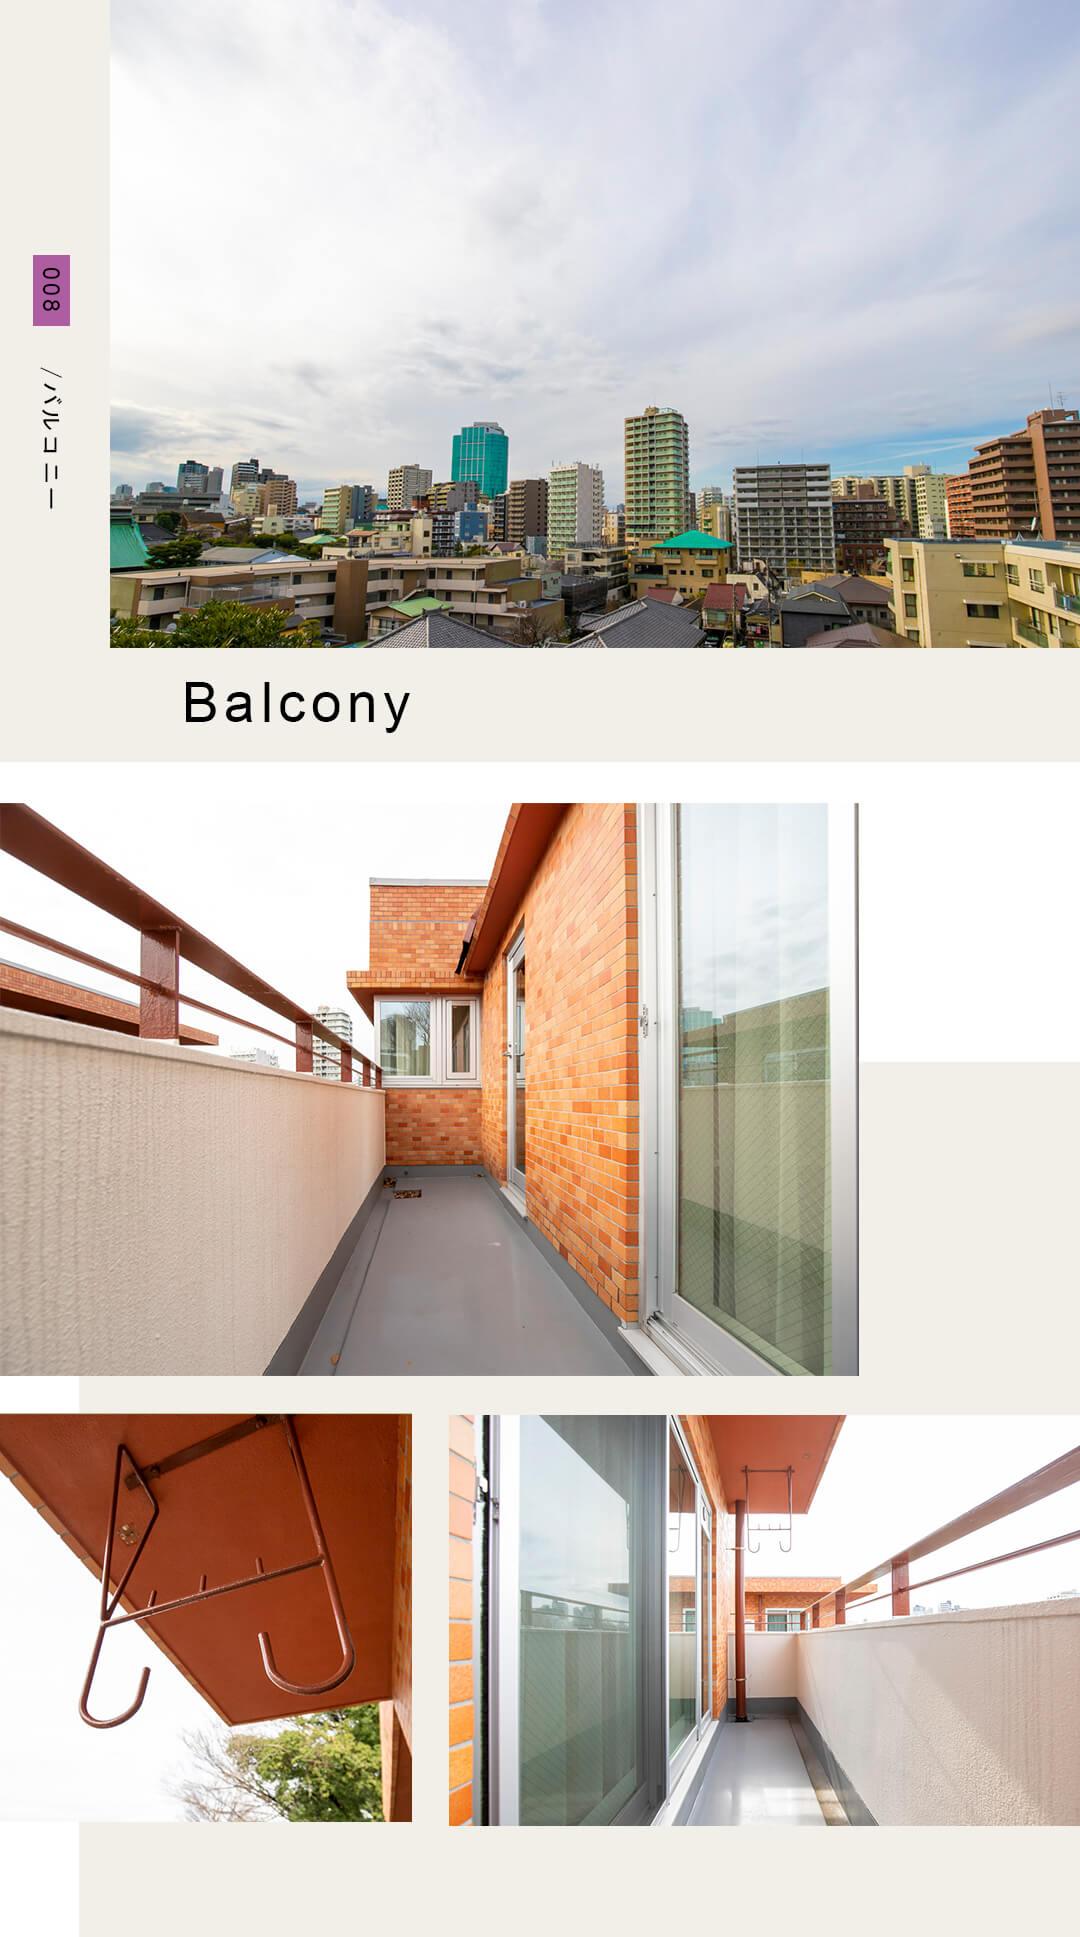 008,Balcony,バルコニー